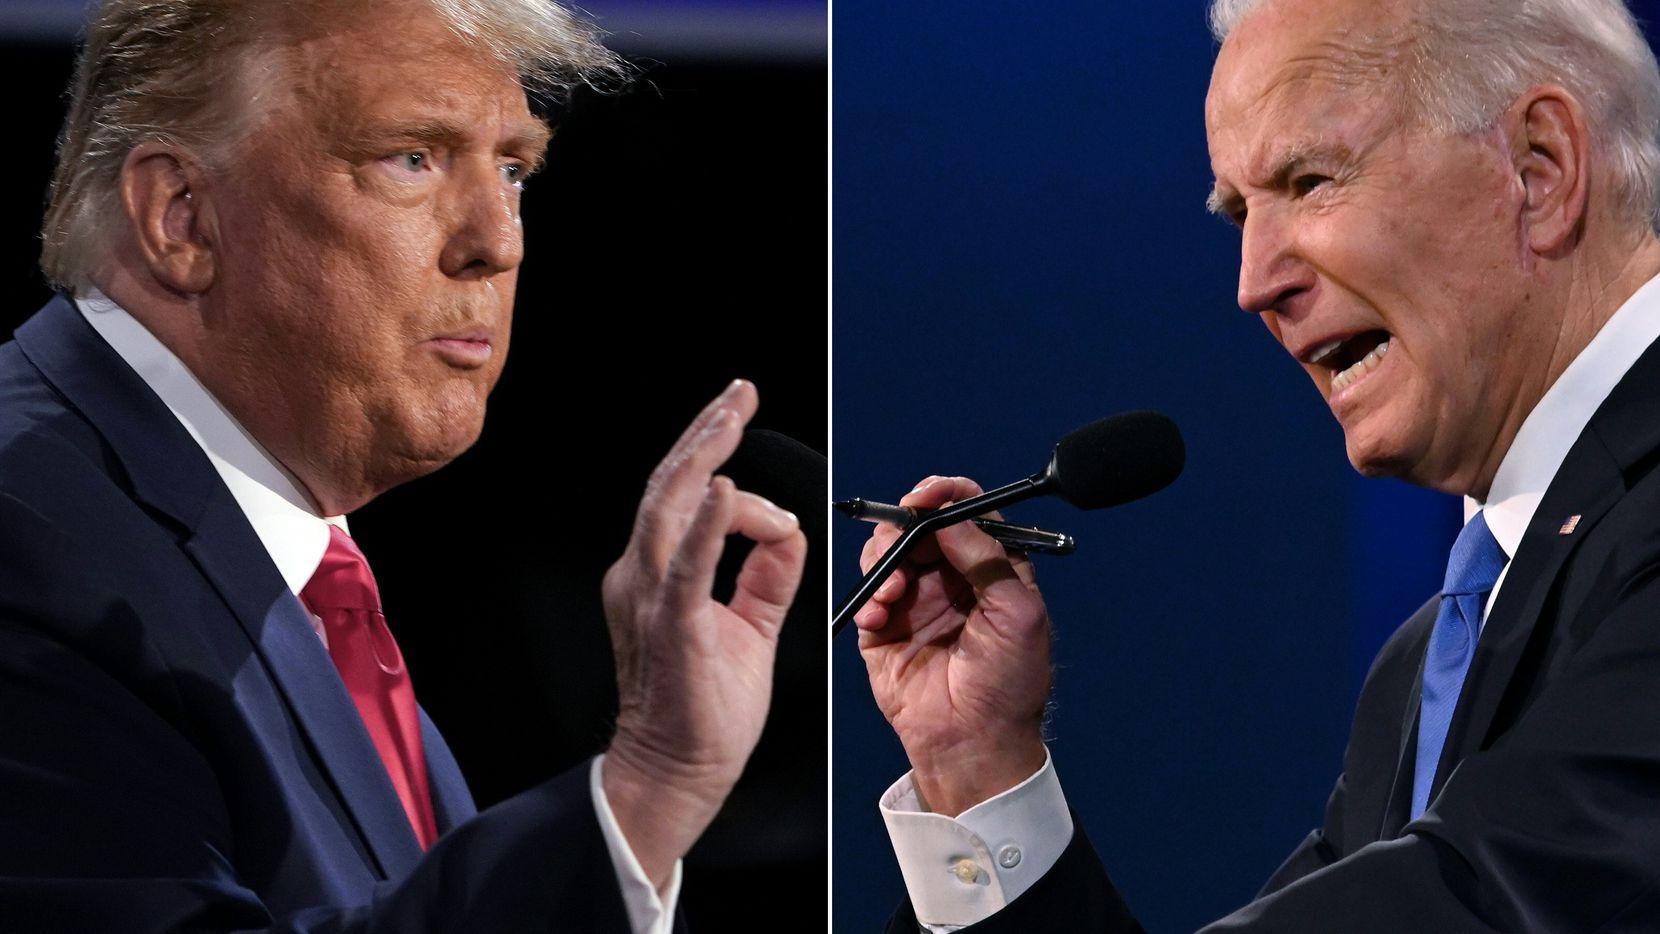 President Donald Trump and former vice president Joe Biden during the final presidential debate, Oct. 22, 2020, at Belmont University in Nashville, Tenn.